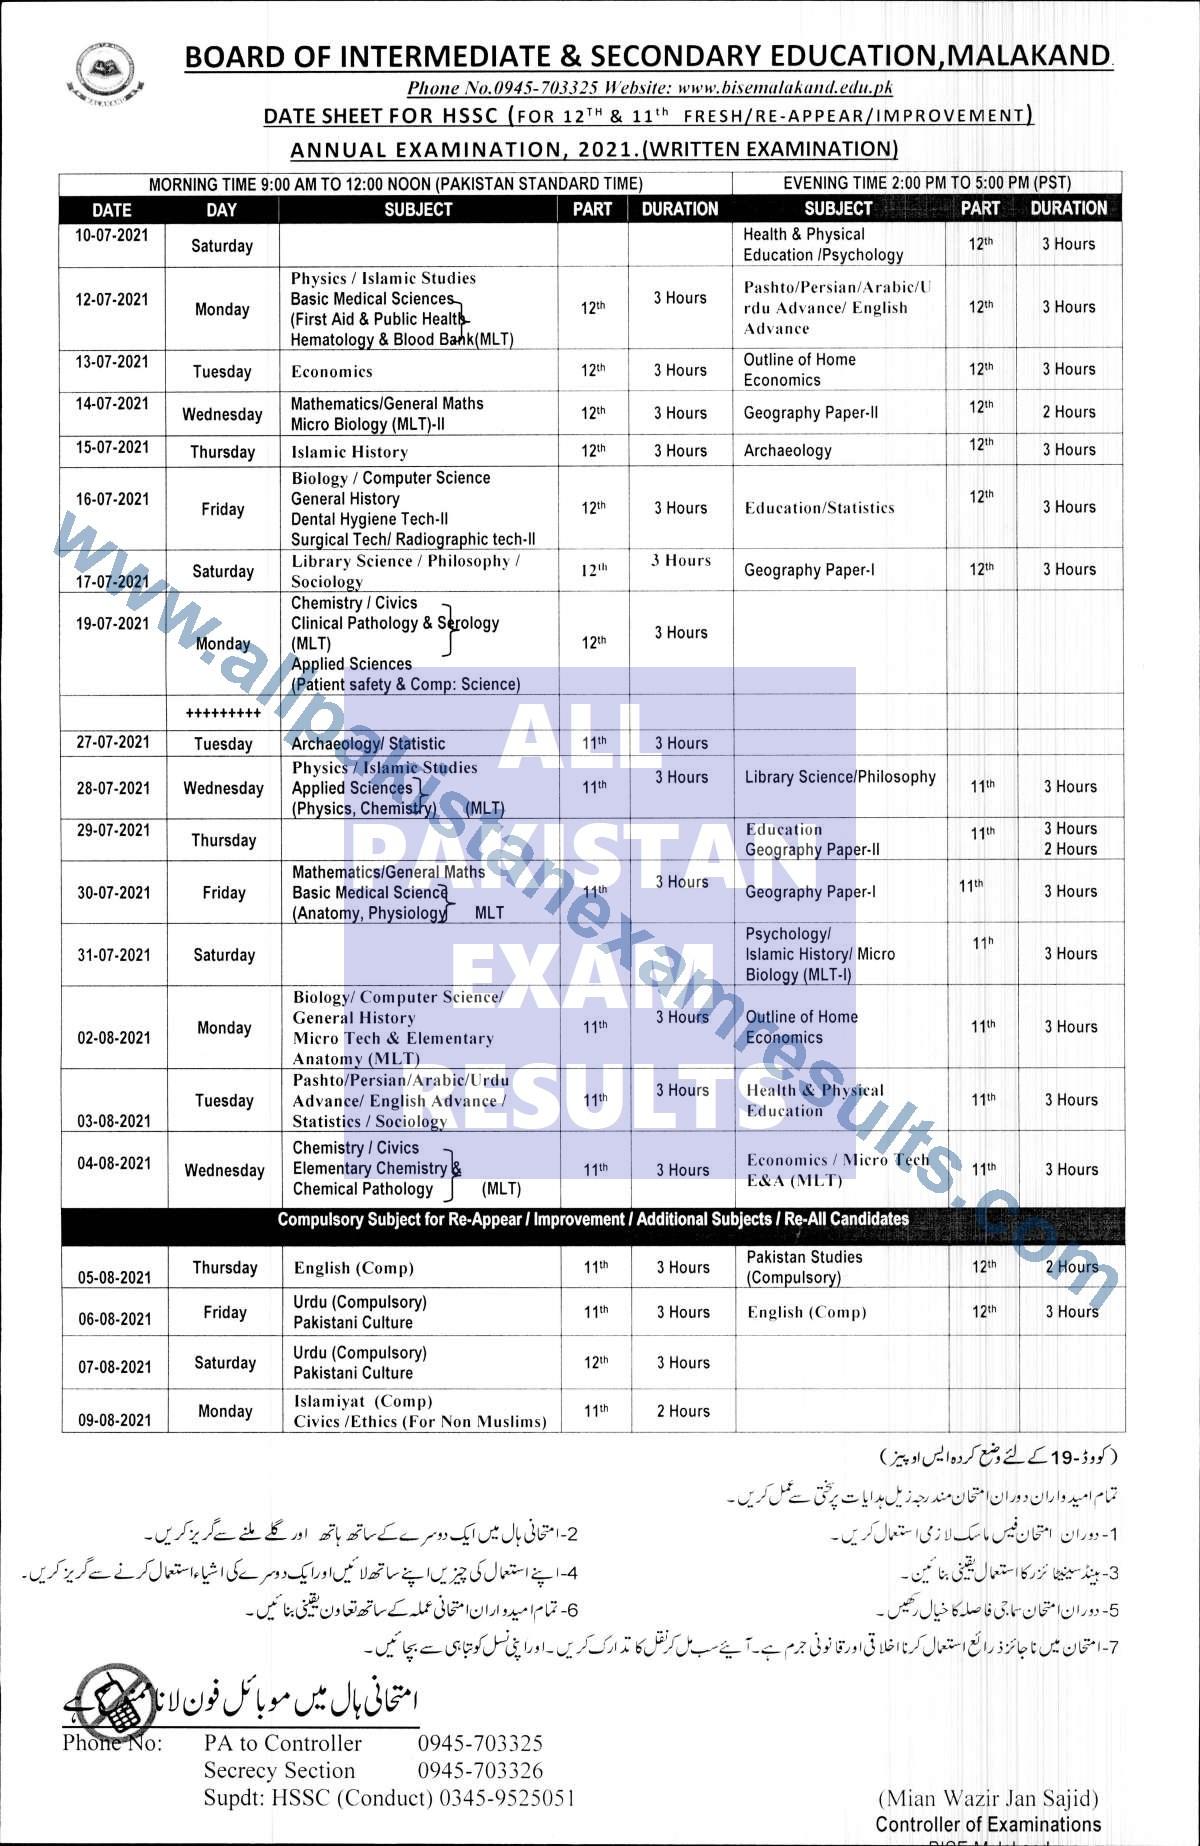 BISE Malakand Date Sheer HSSC 2021 Annual Exam